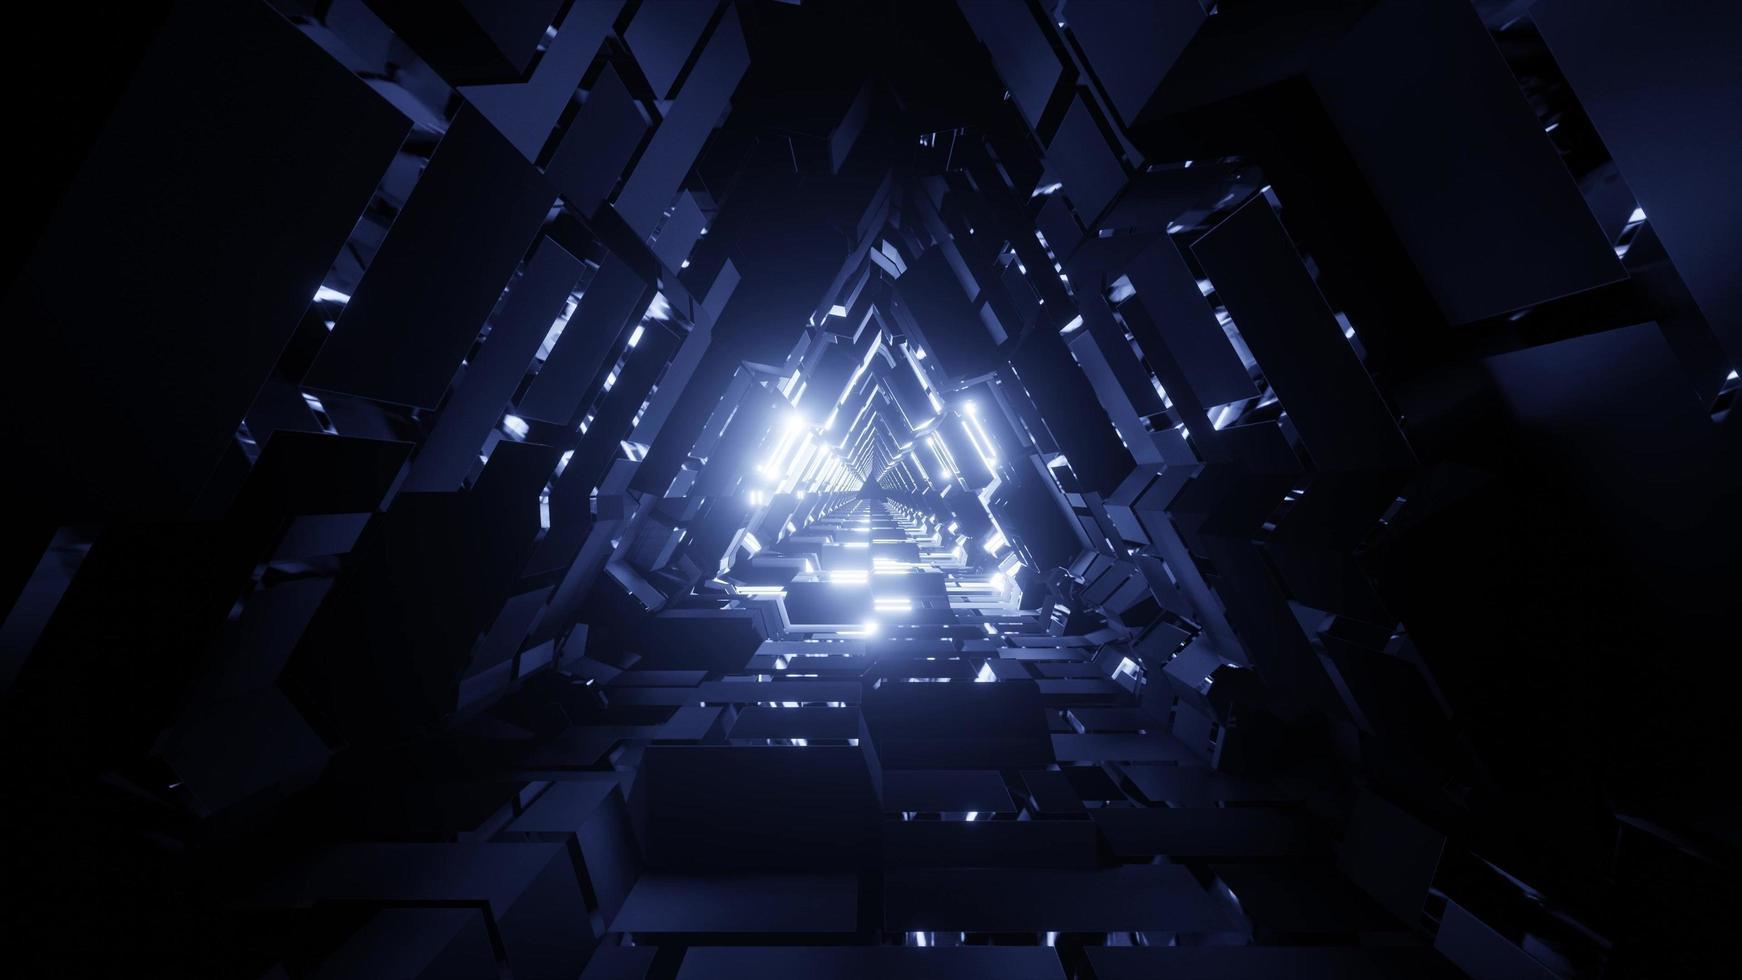 Un tunnel spatial triangle illustration 3d avec texture photo